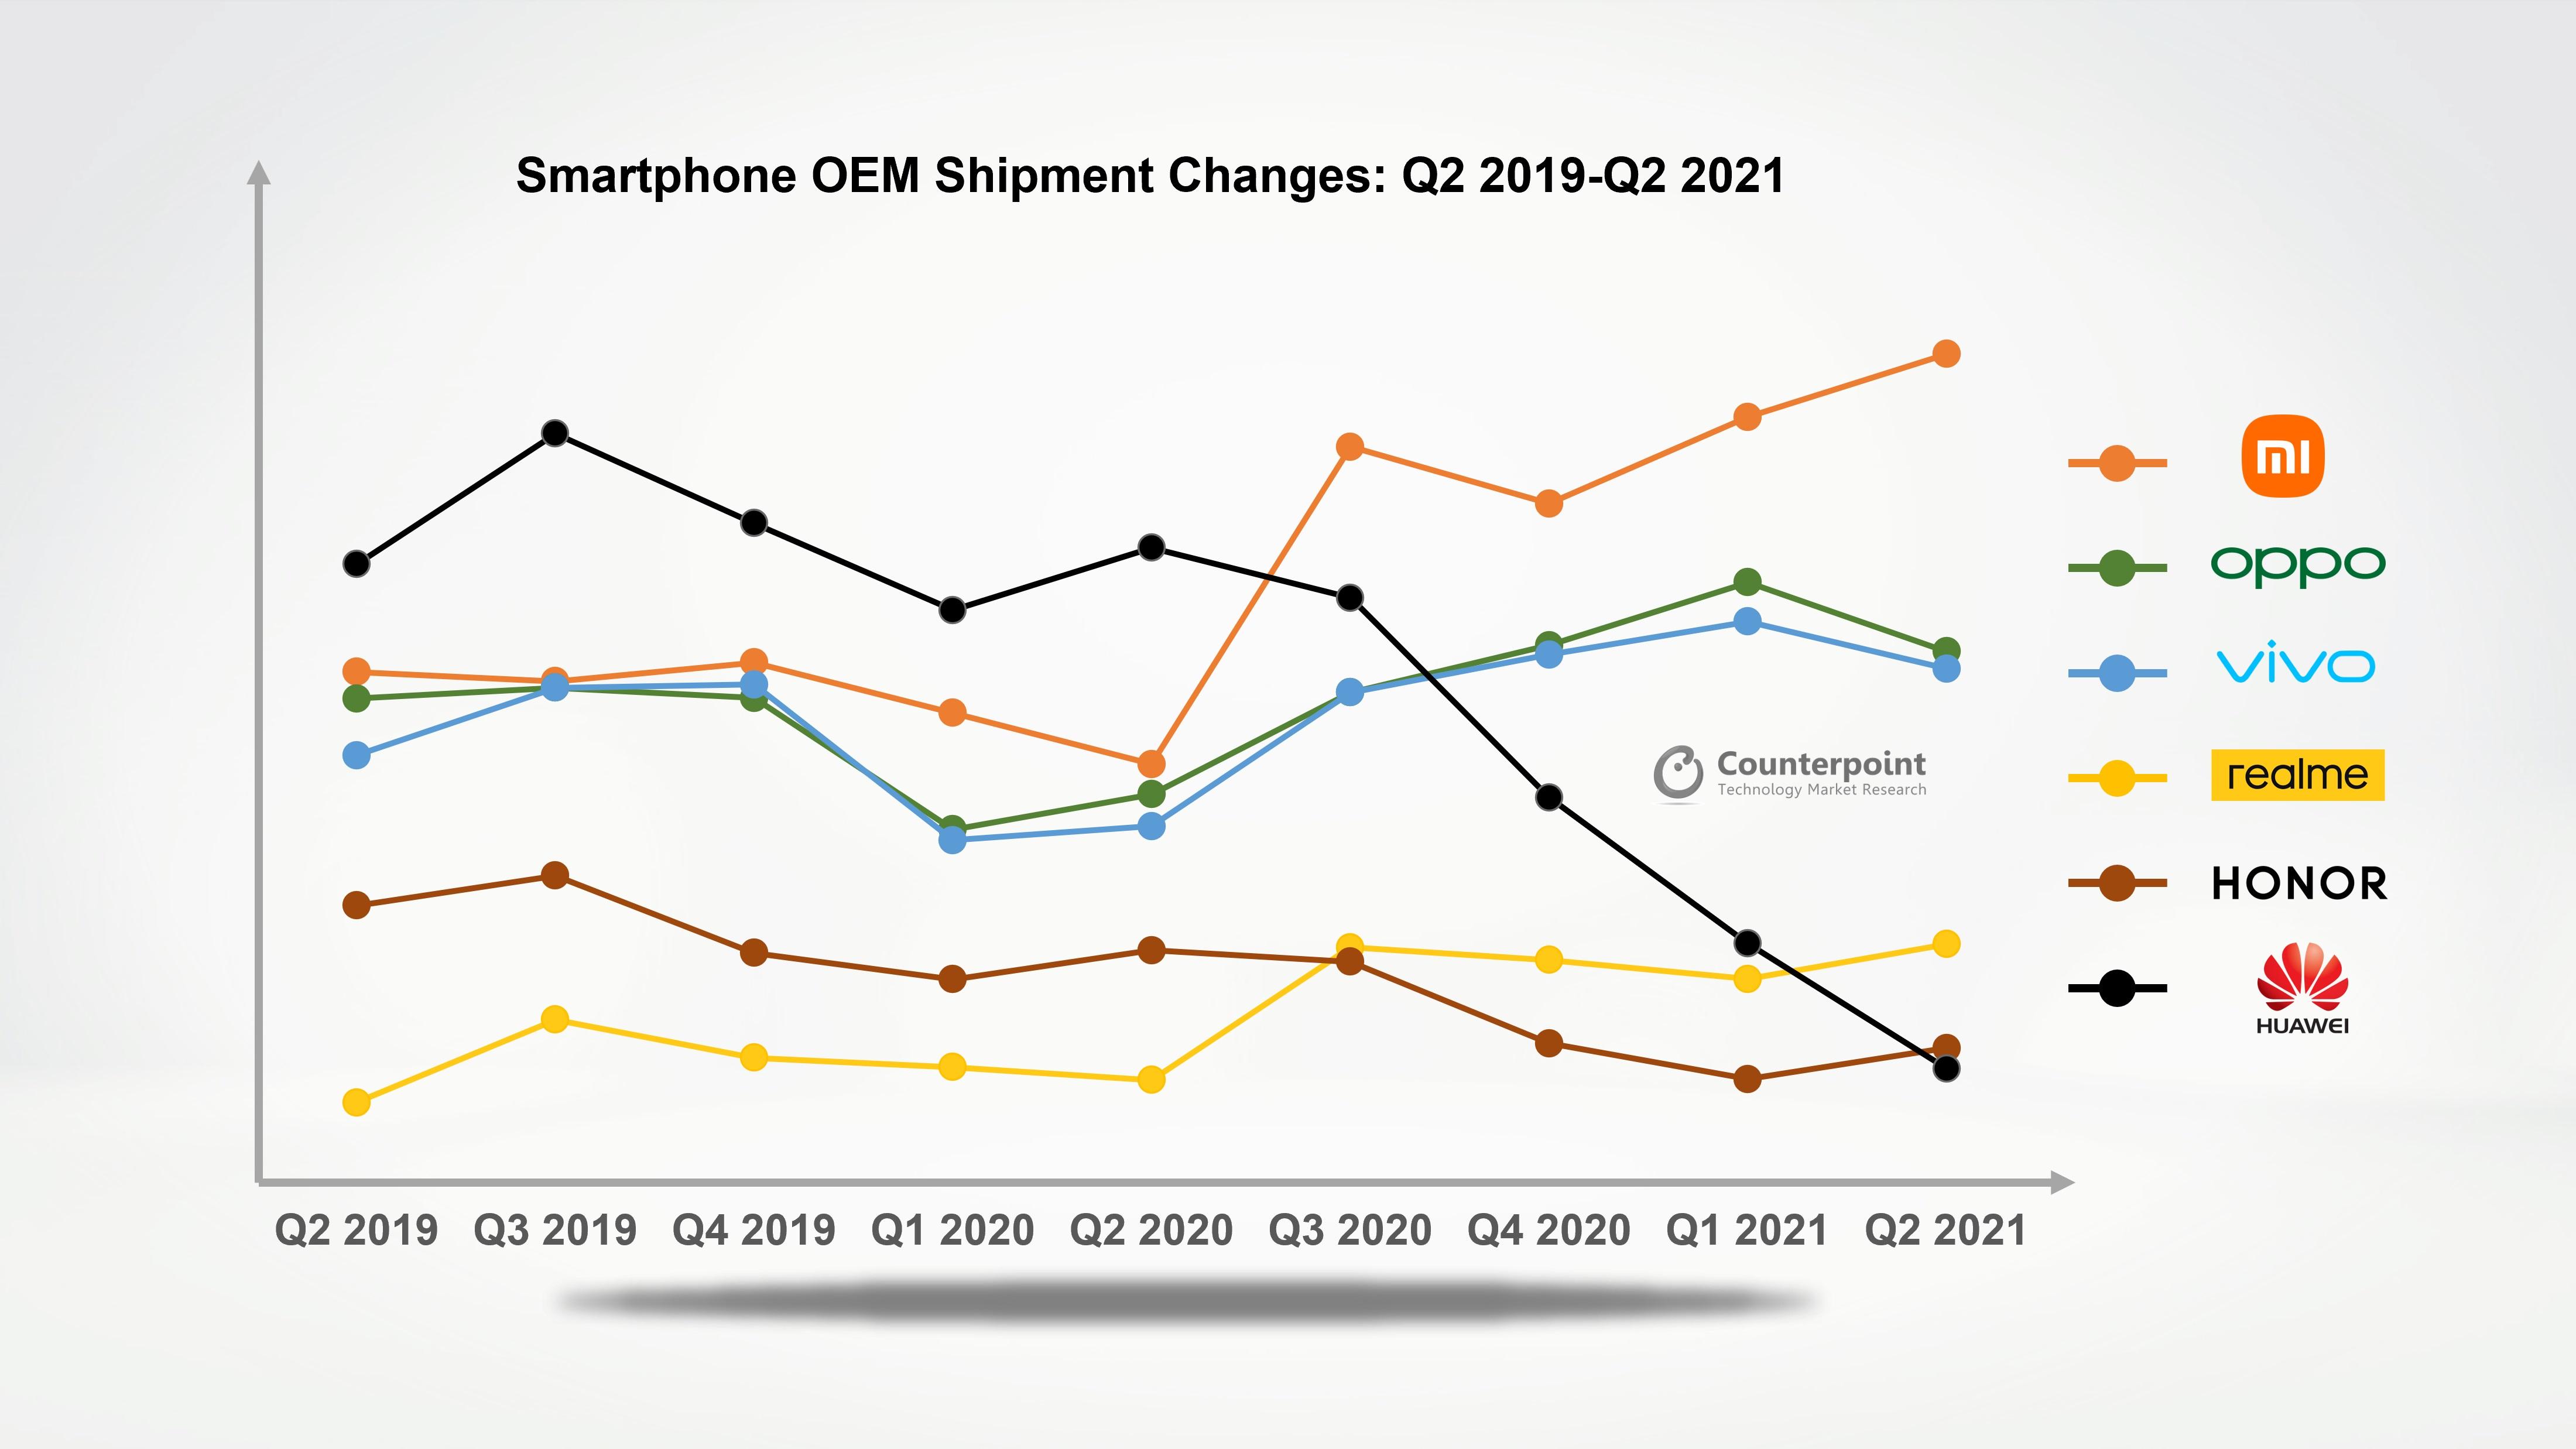 dostawy smartfonów drugi kwartał Q2 2021 Xiaomi Oppo Vivo realme Honor Huawei Counterpoint Research